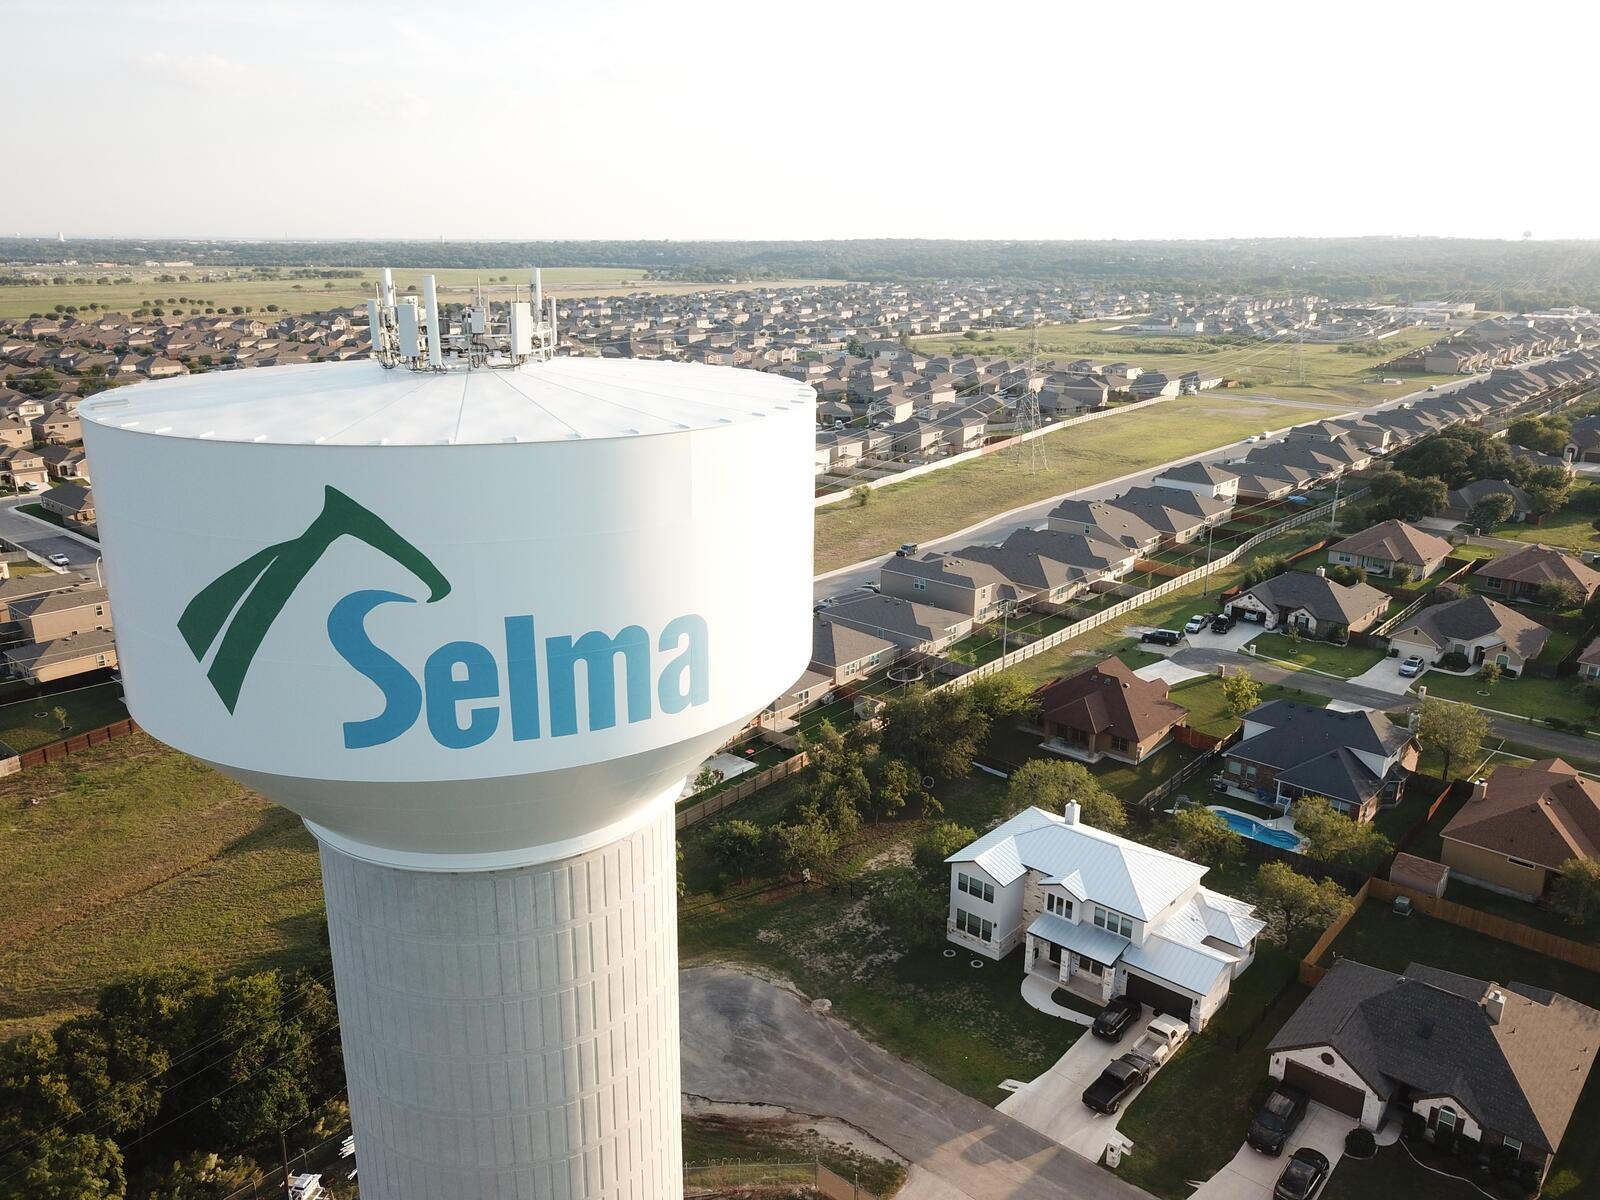 City of selma 11 updates nextdoor sciox Choice Image